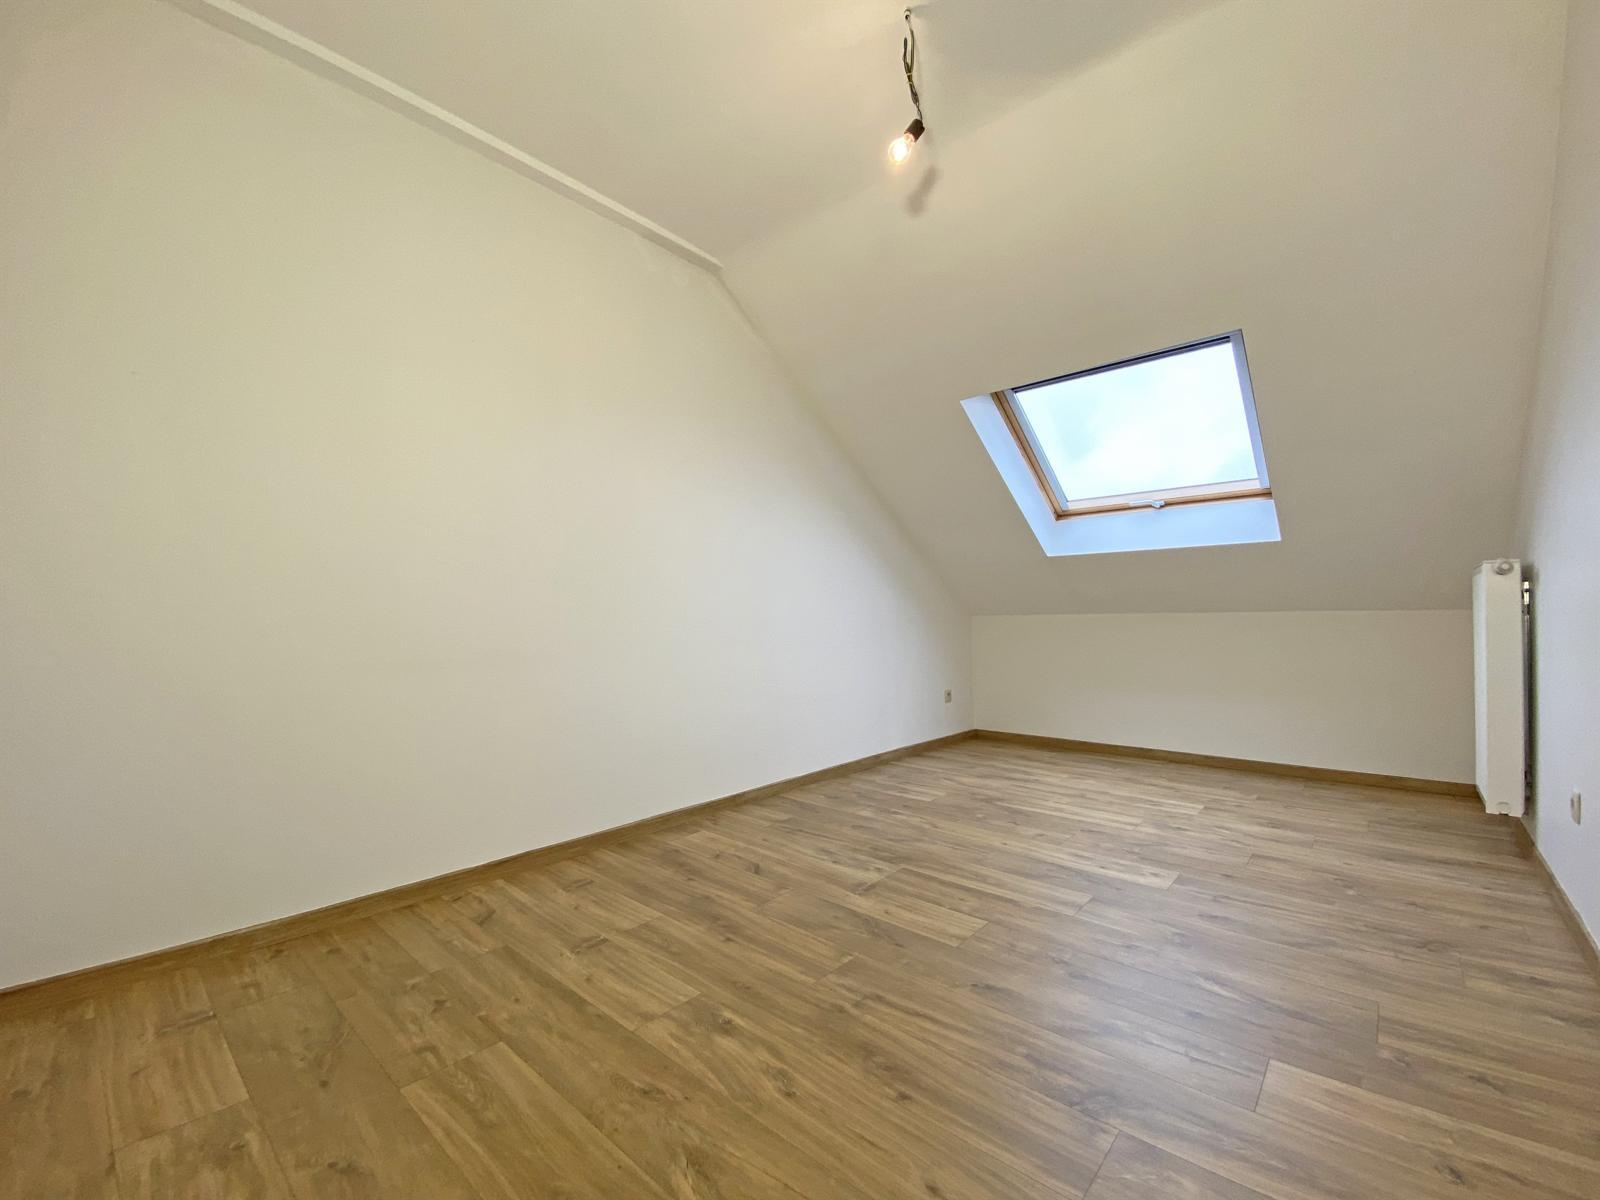 Appartement - Bertrix - #4507479-6